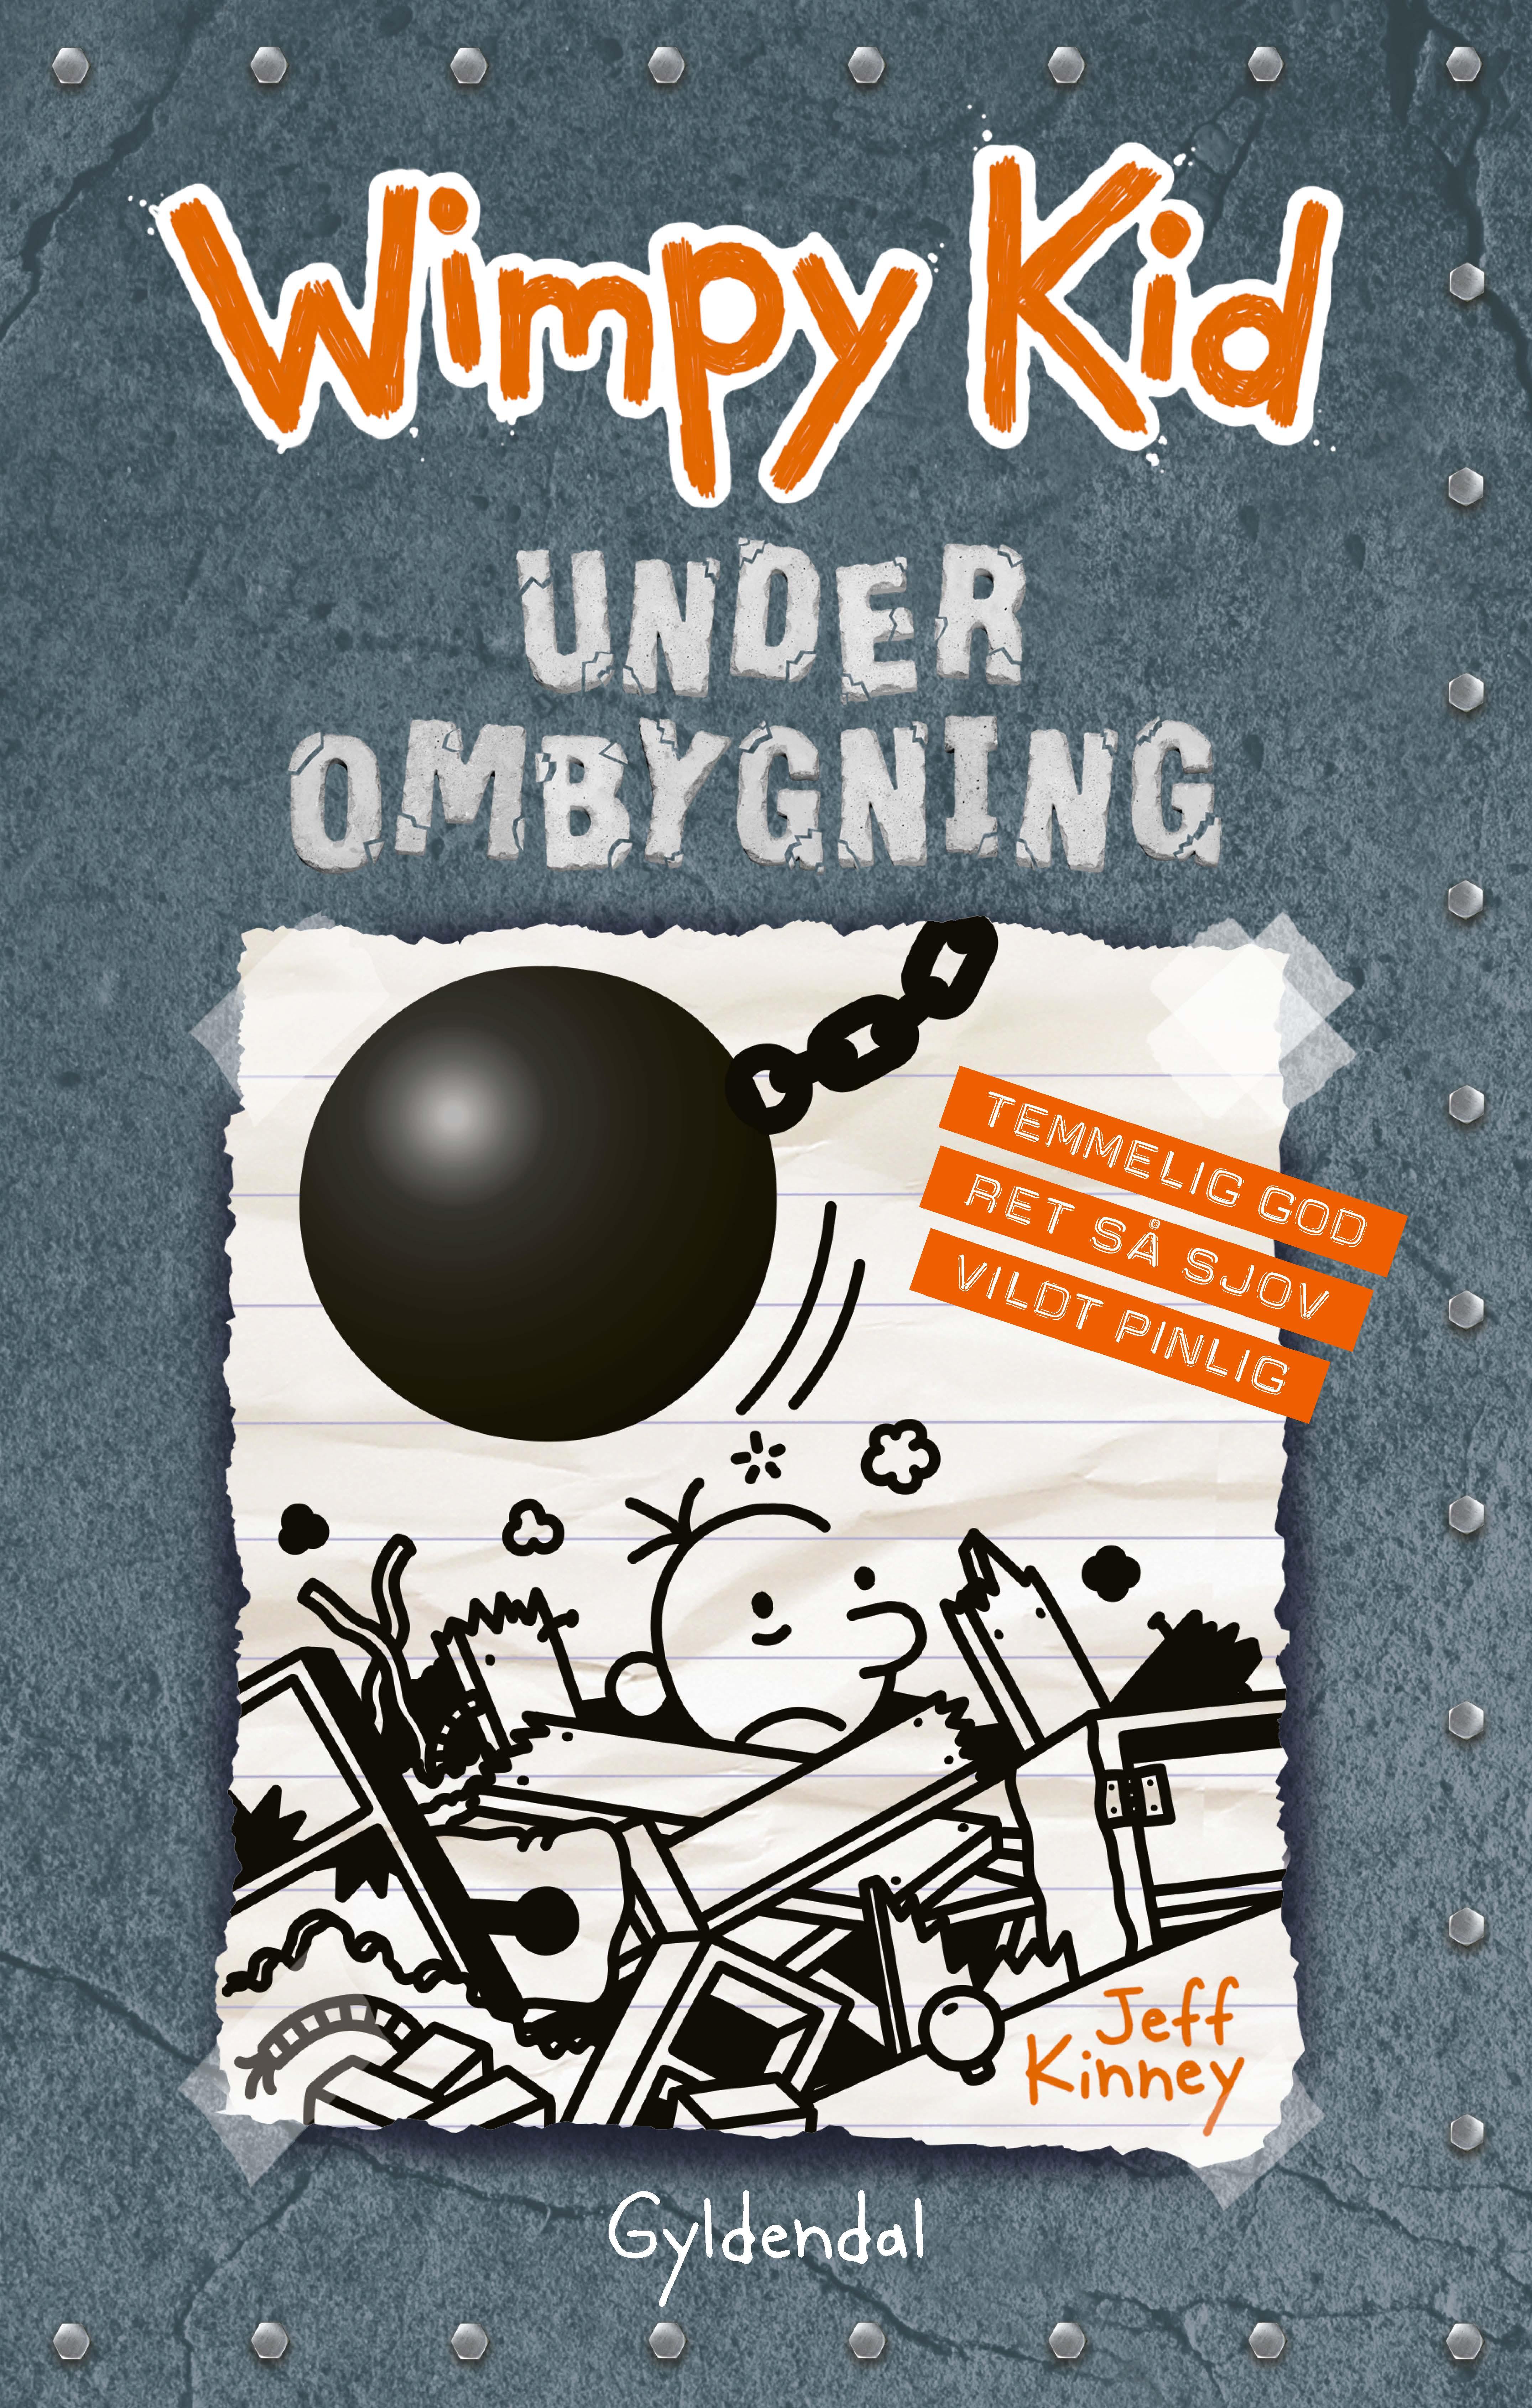 Wimpy kid: Wimpy Kid 14 - Under ombygning - Jeff Kinney - Bøger - Gyldendal - 9788702277104 - January 27, 2020